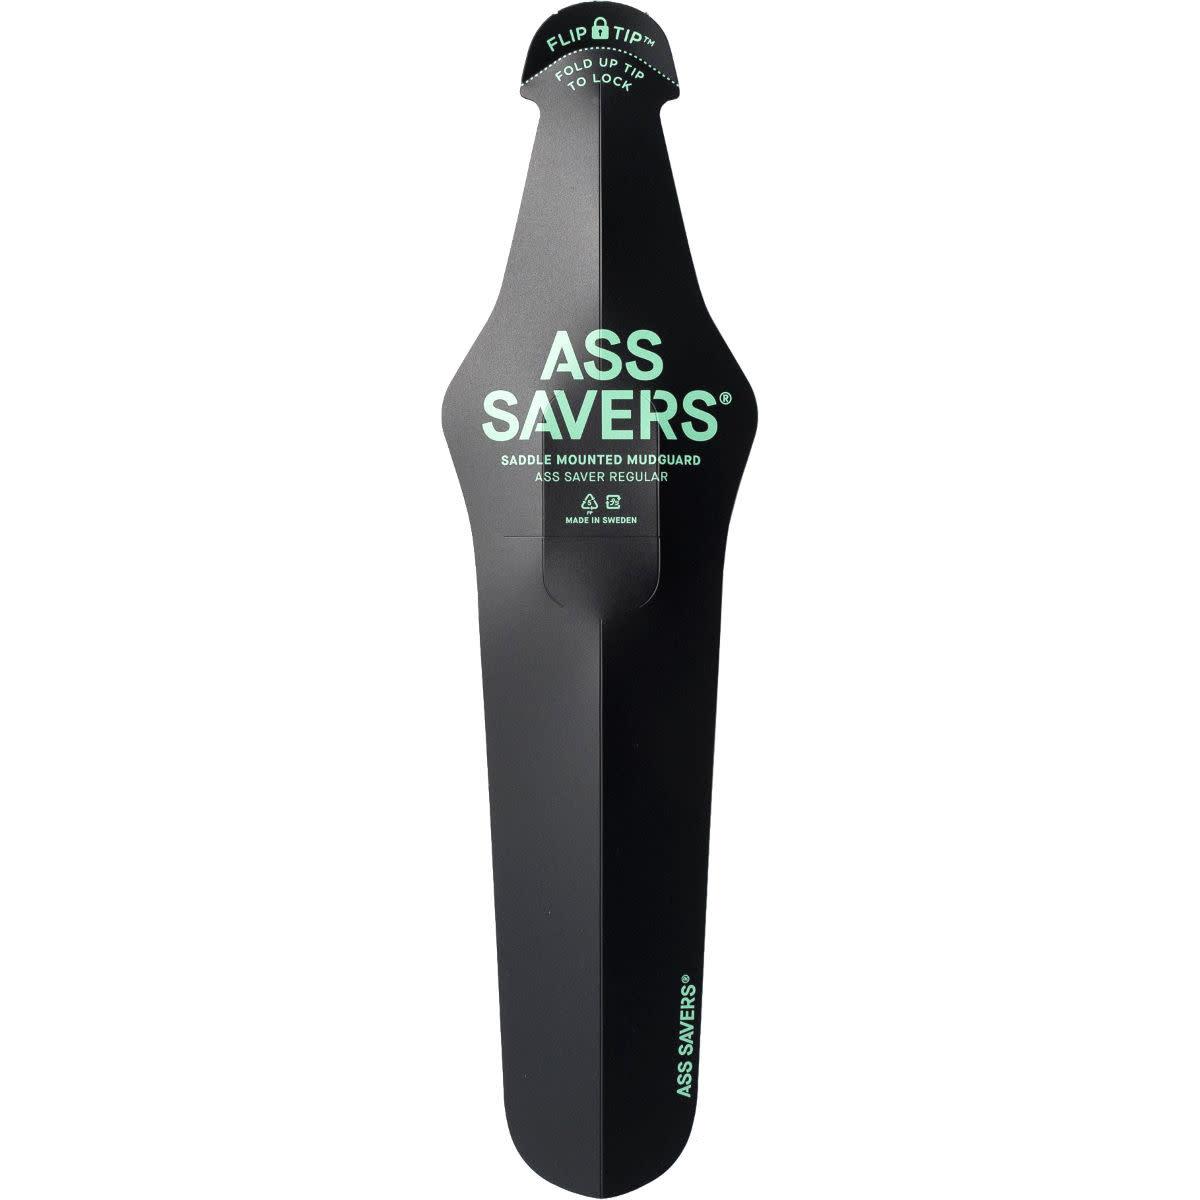 ASS SAVER REGULAR Rear Black